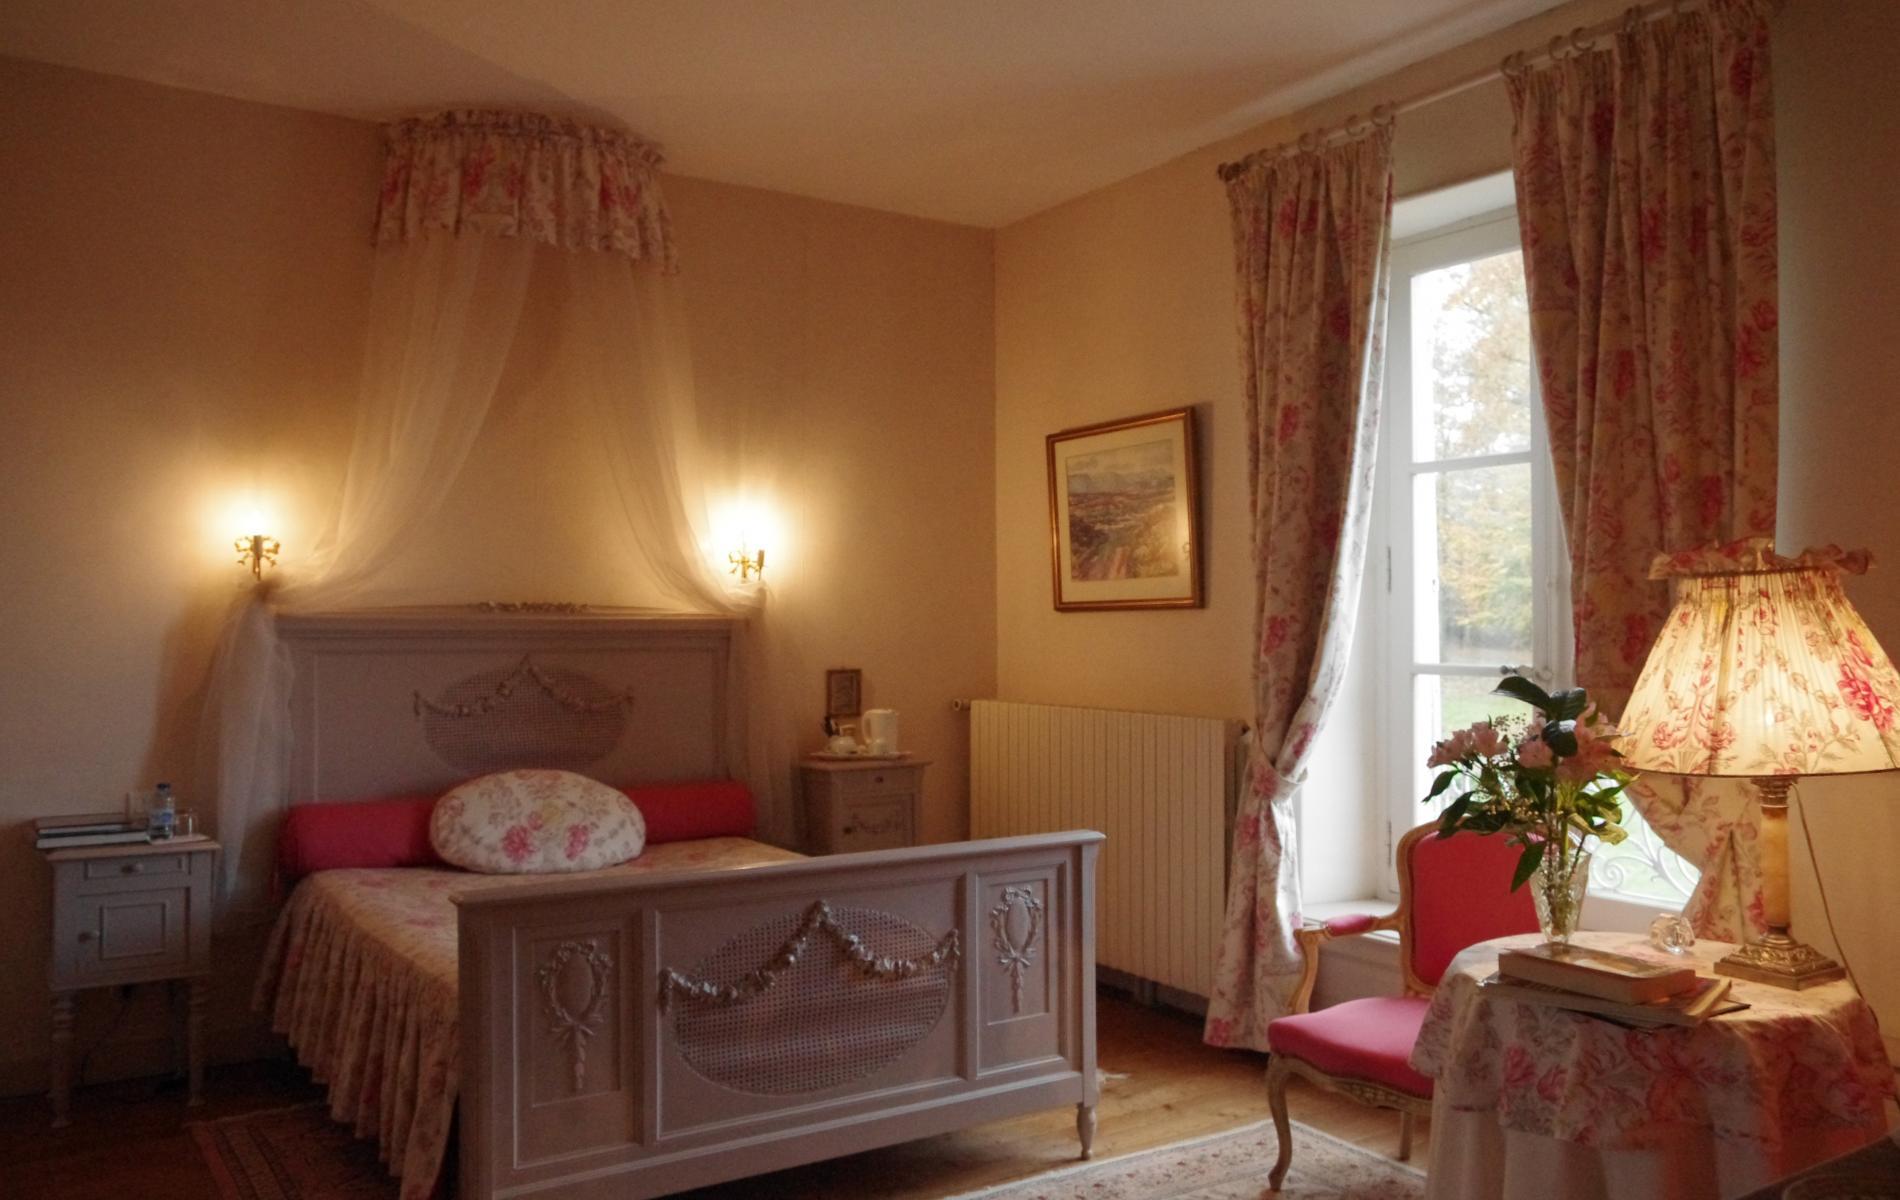 Hotel Le Mans Les Chambres Spacieuses Domaine De Chateany